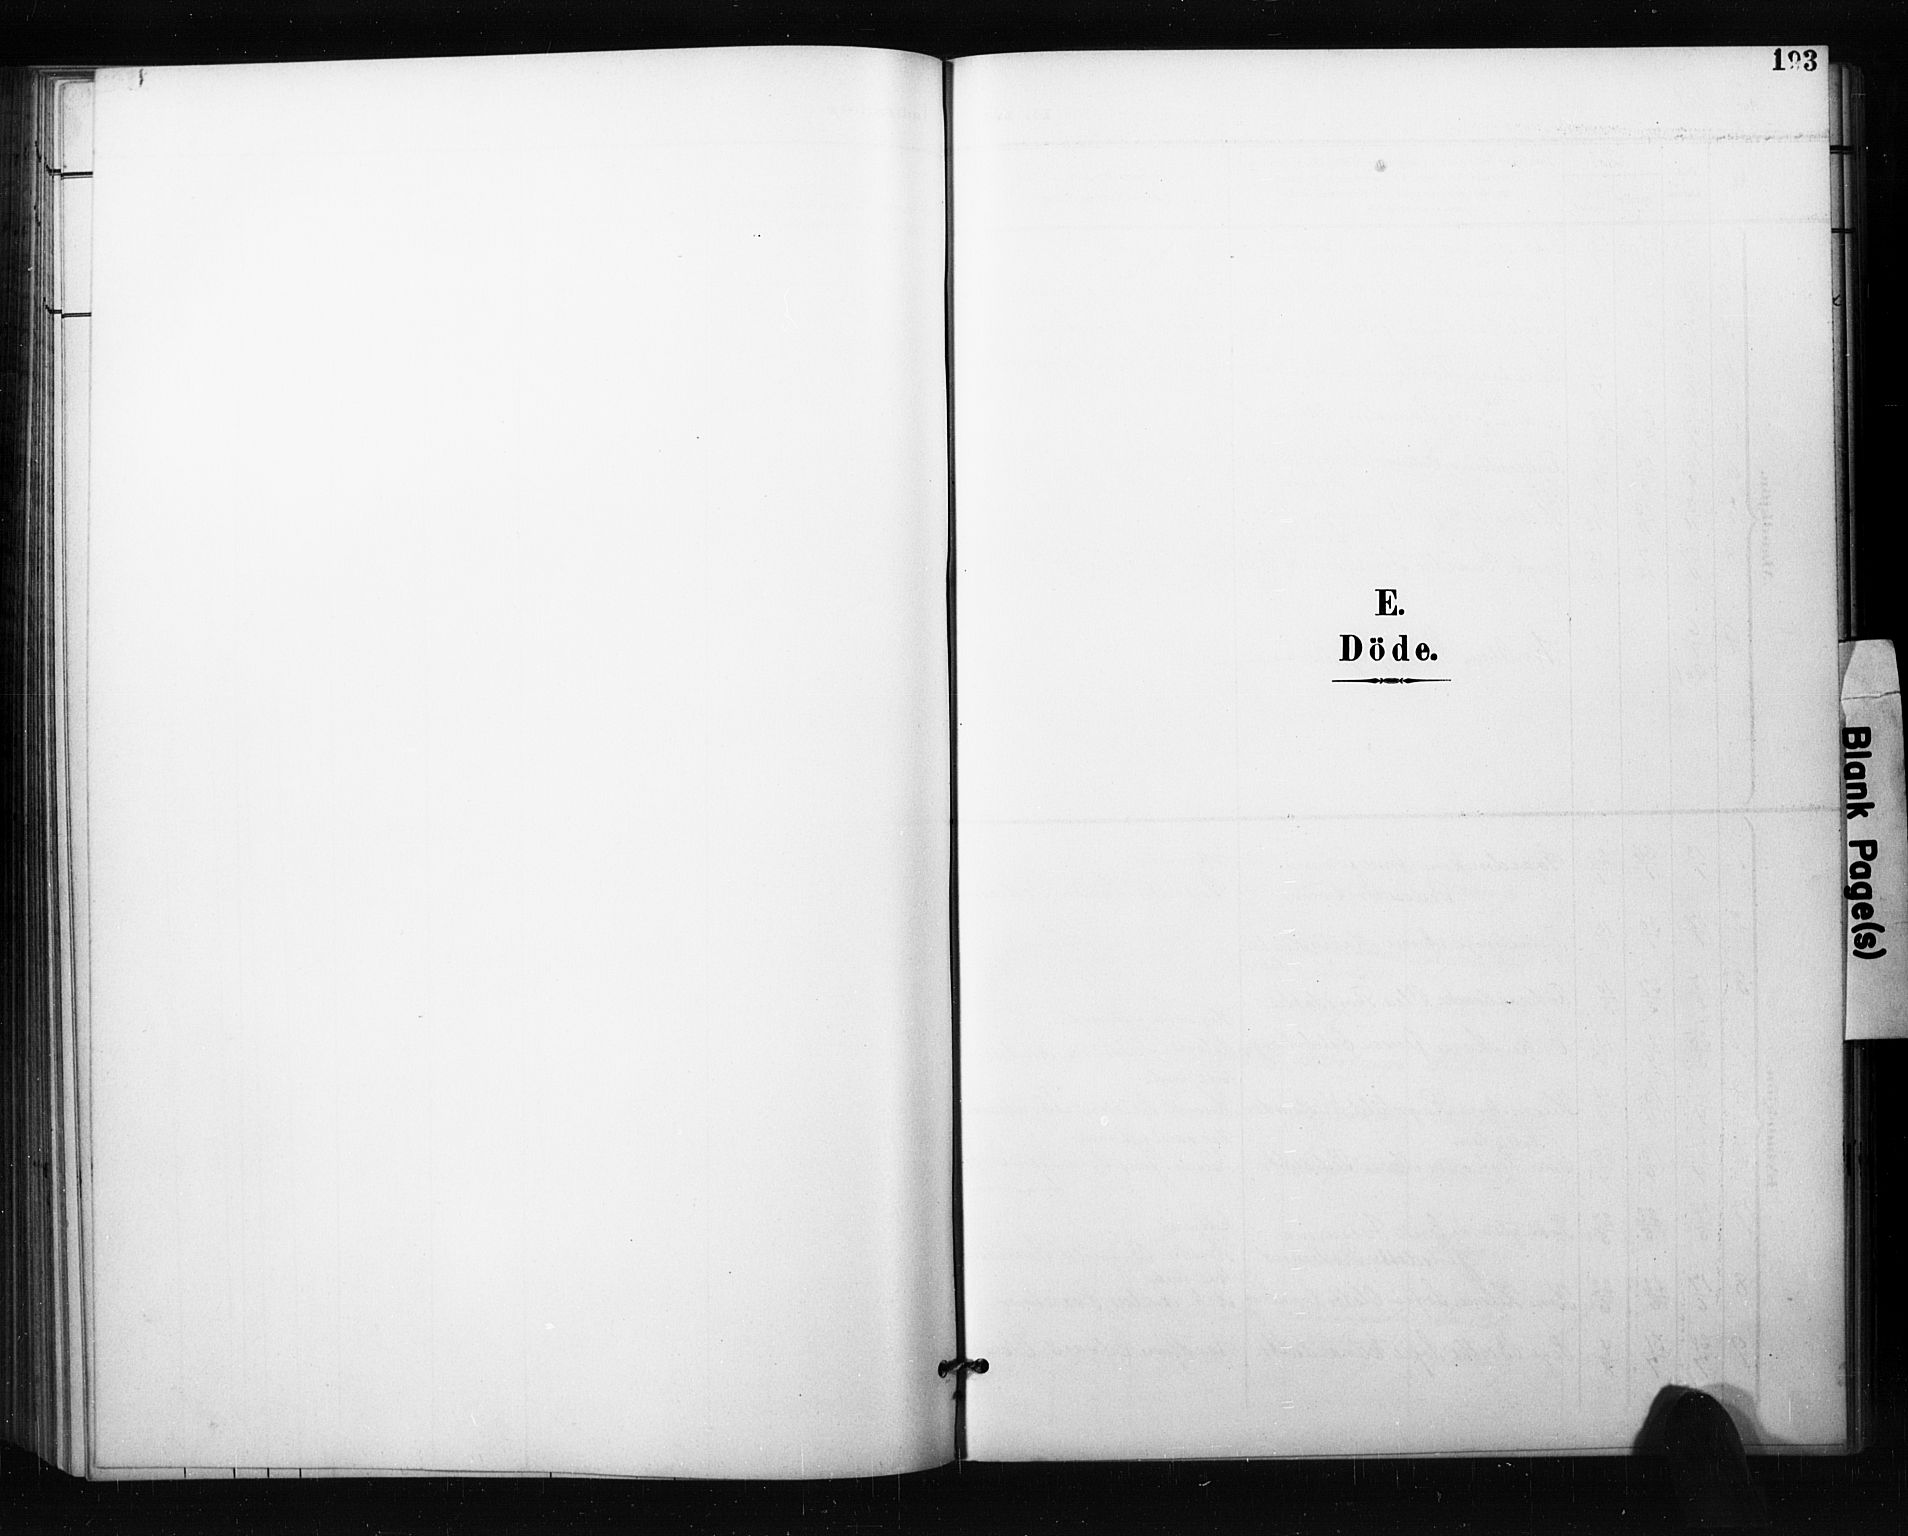 SAO, Aremark prestekontor Kirkebøker, G/Gb/L0001: Klokkerbok nr. II 1, 1901-1927, s. 193